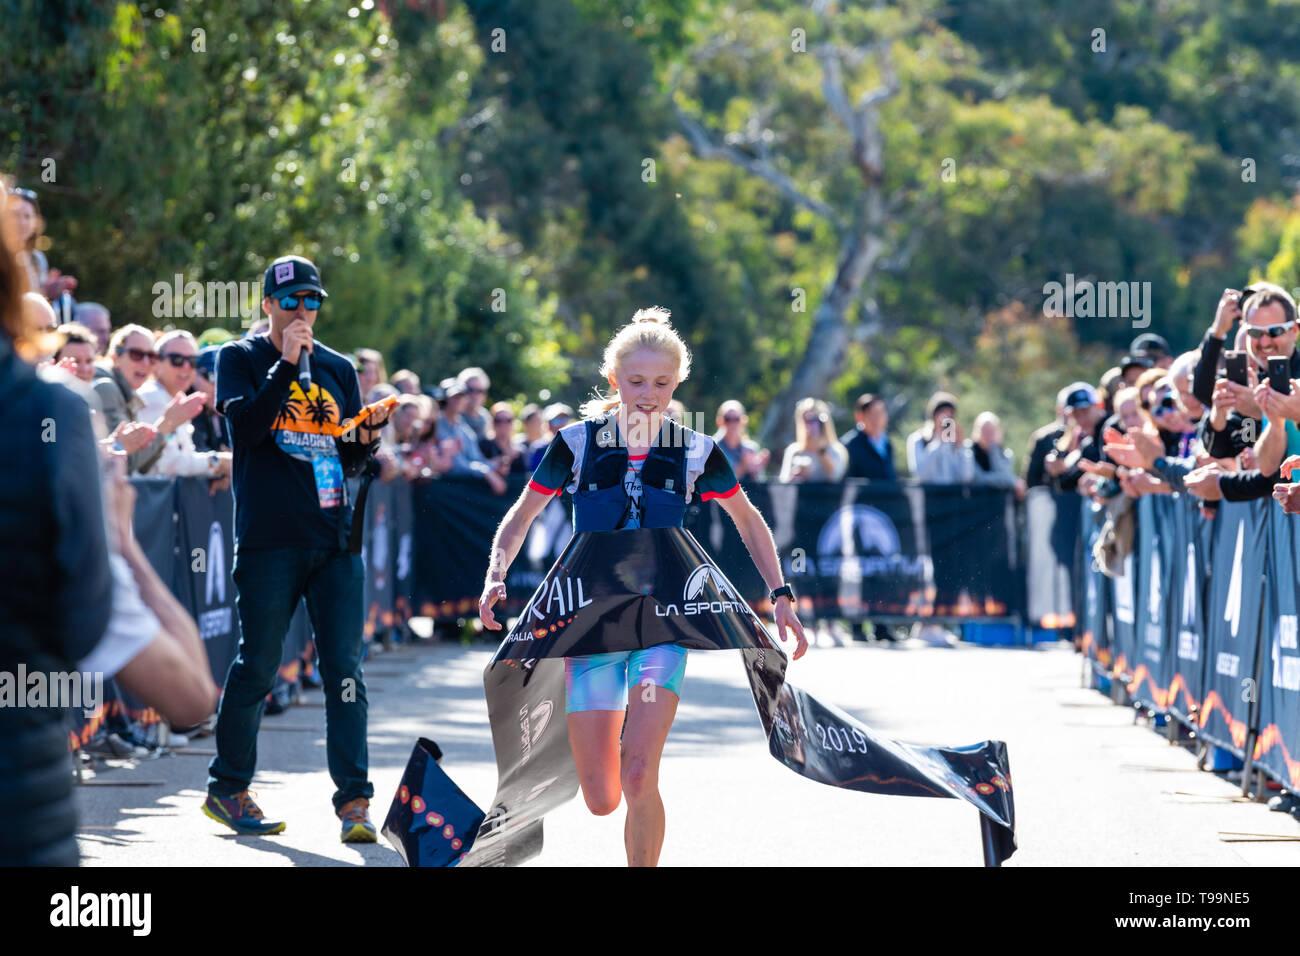 Blue Mountains, Australia - April 16 2019: Ultra-Trail Australia UTA11 race. Runner Paige Penrose, overall winner of womens event, at the finish line. - Stock Image